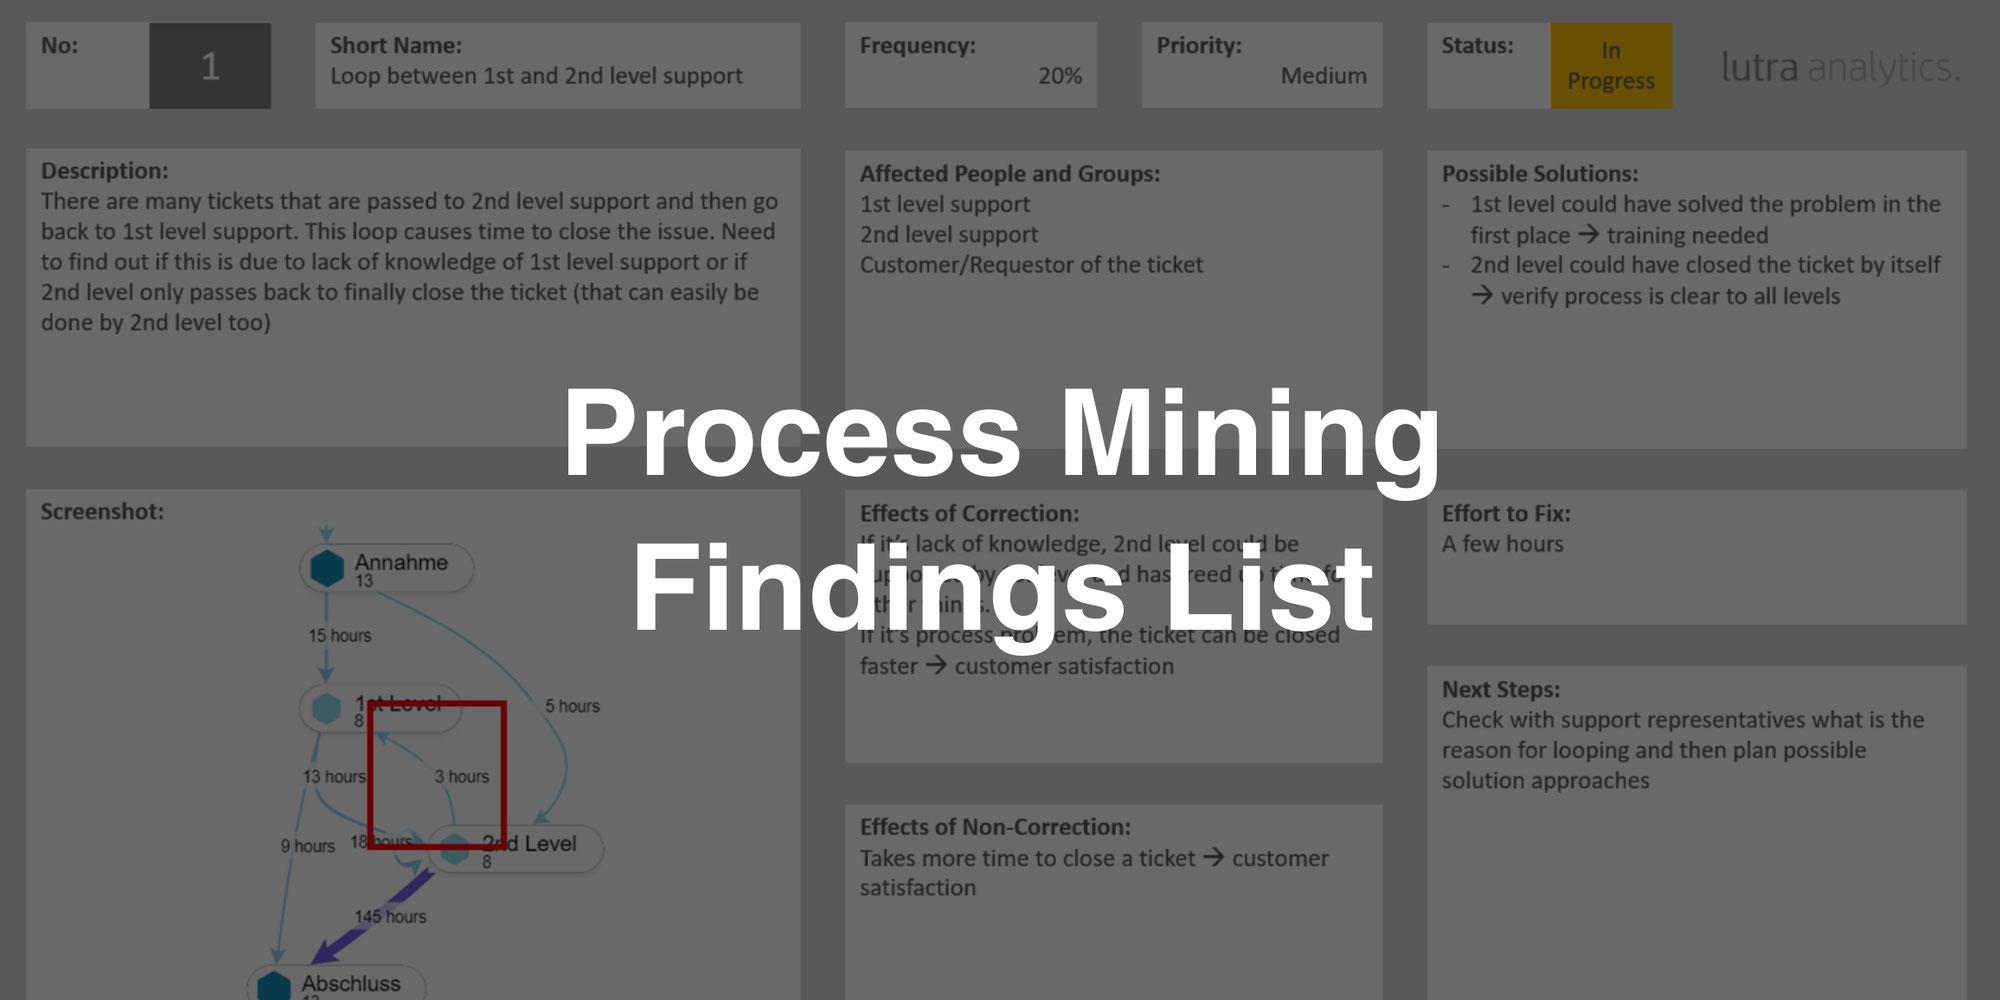 Process Mining Findings List